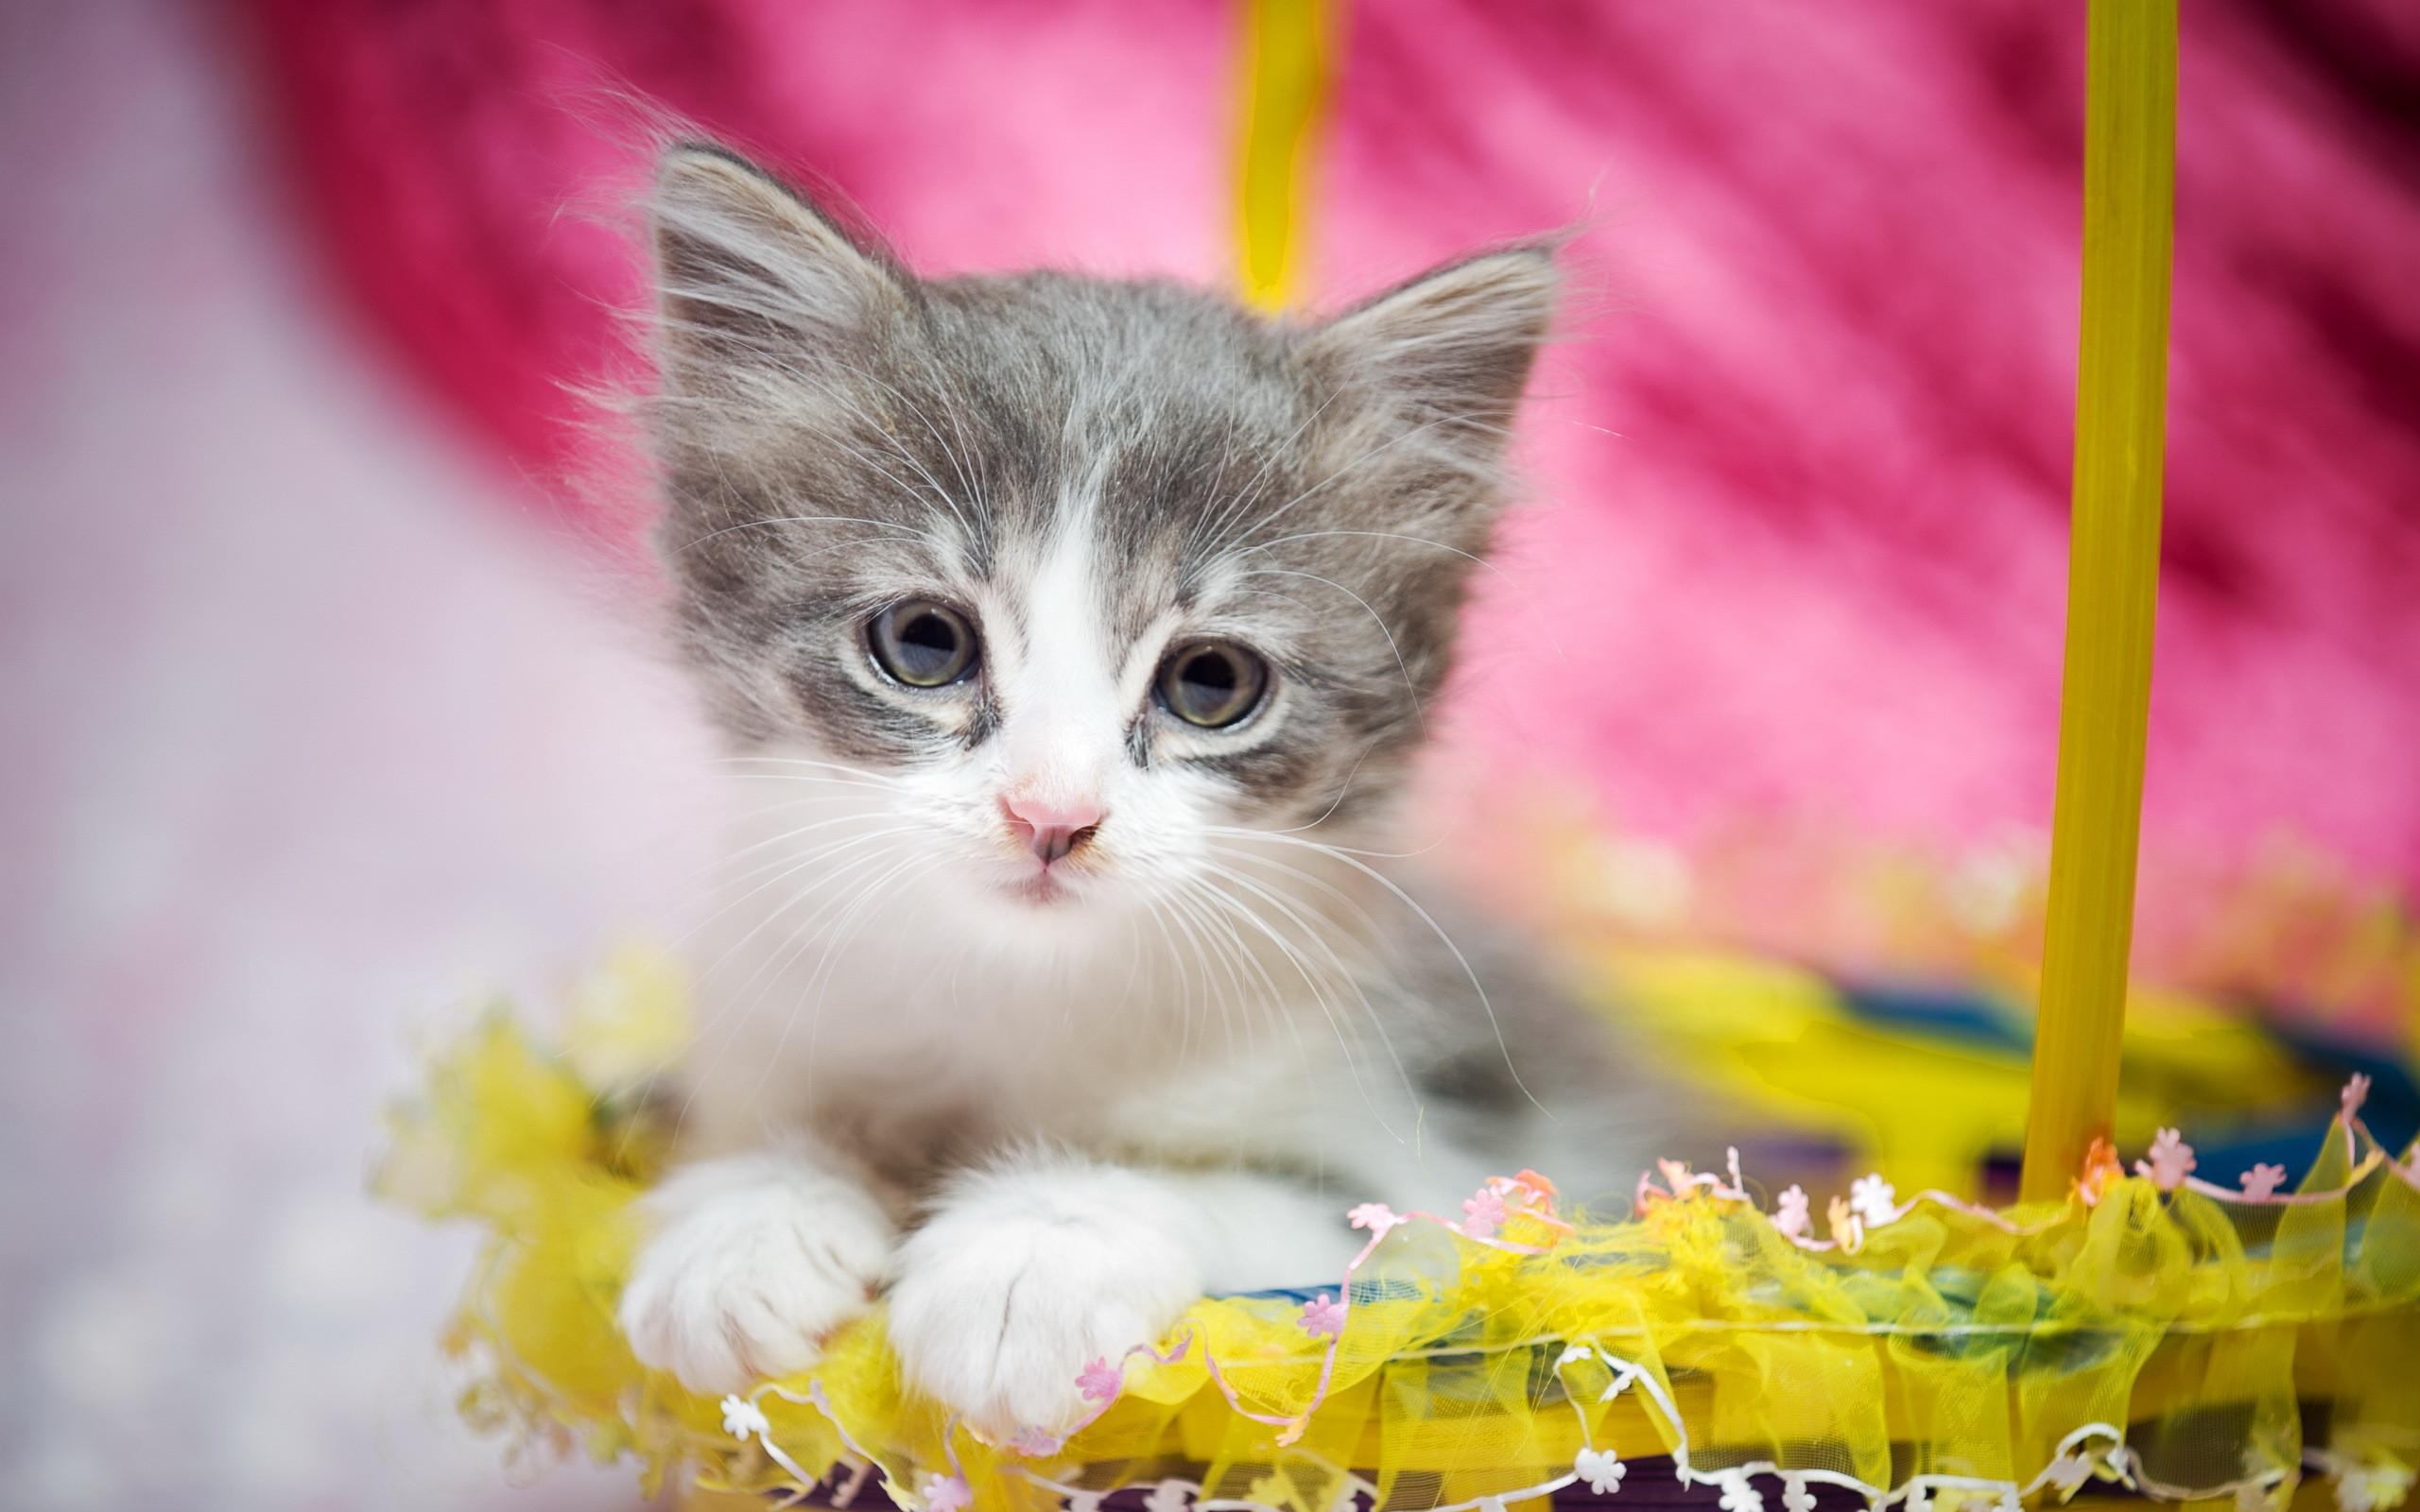 Res: 2560x1600, Cute kitten, Cat, HD